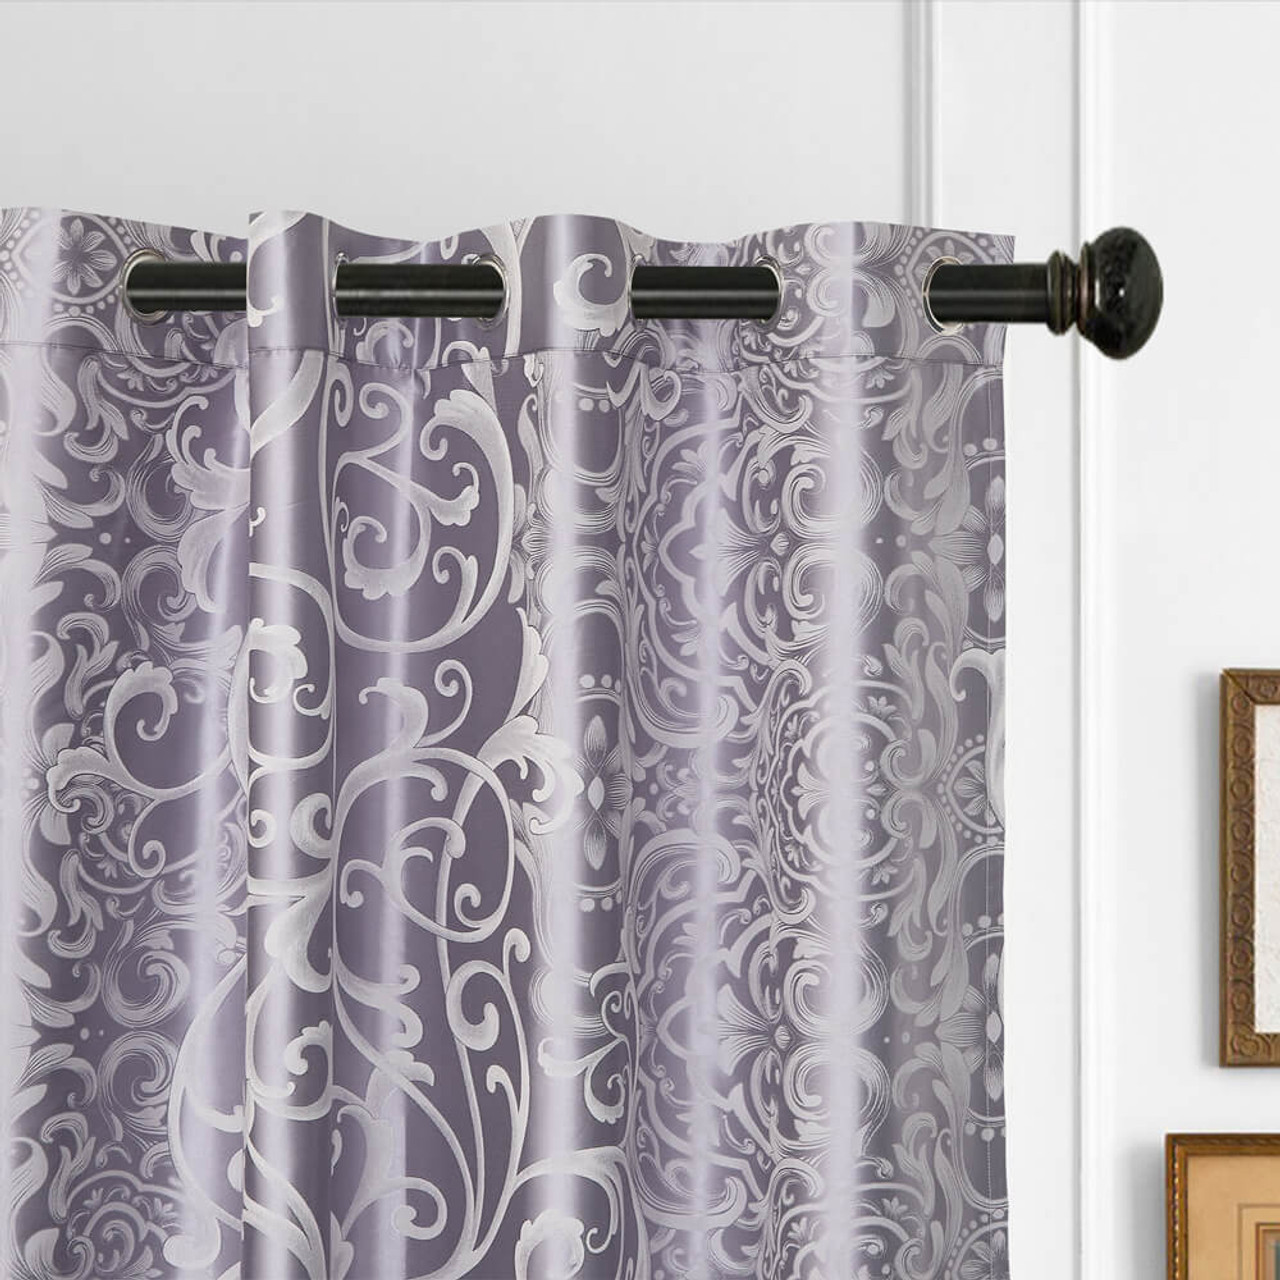 Drop-Shipping DMC718 Dolce Mela Curtain Panel Semi-Blackout Drapes